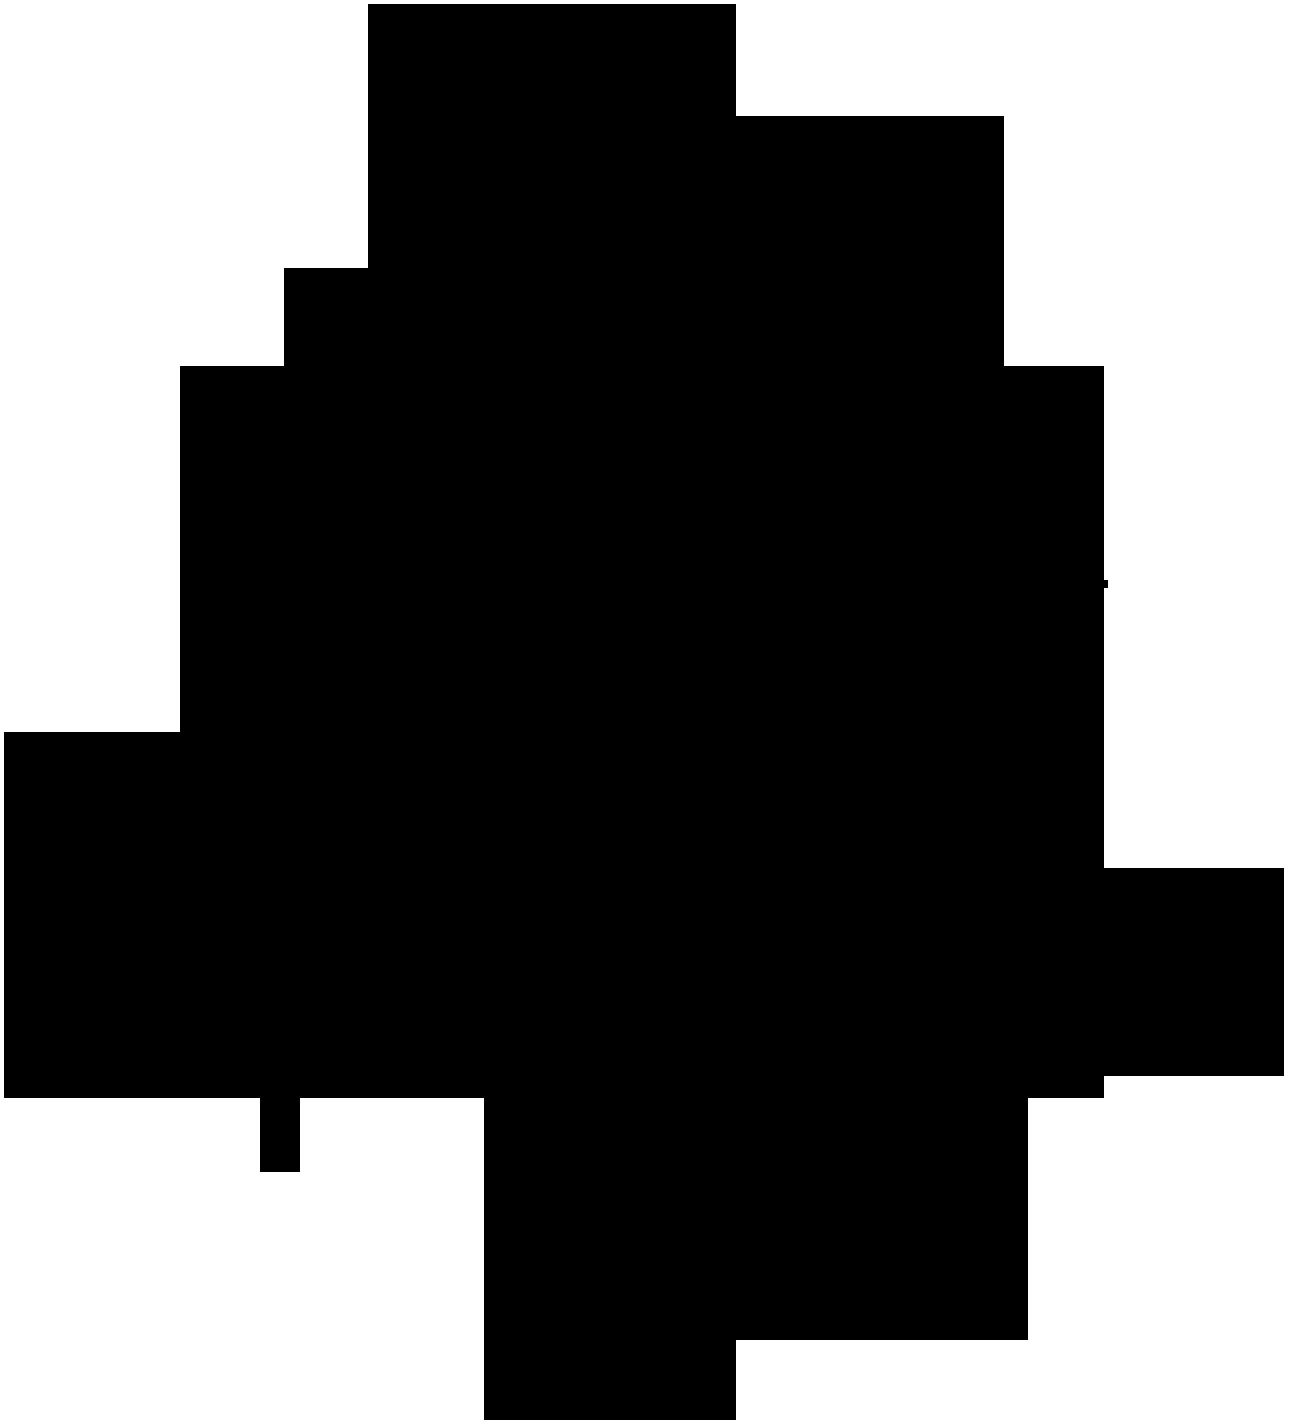 [Concelho] Esquadra Rachel_Alucard_(Emblem,_Crest)